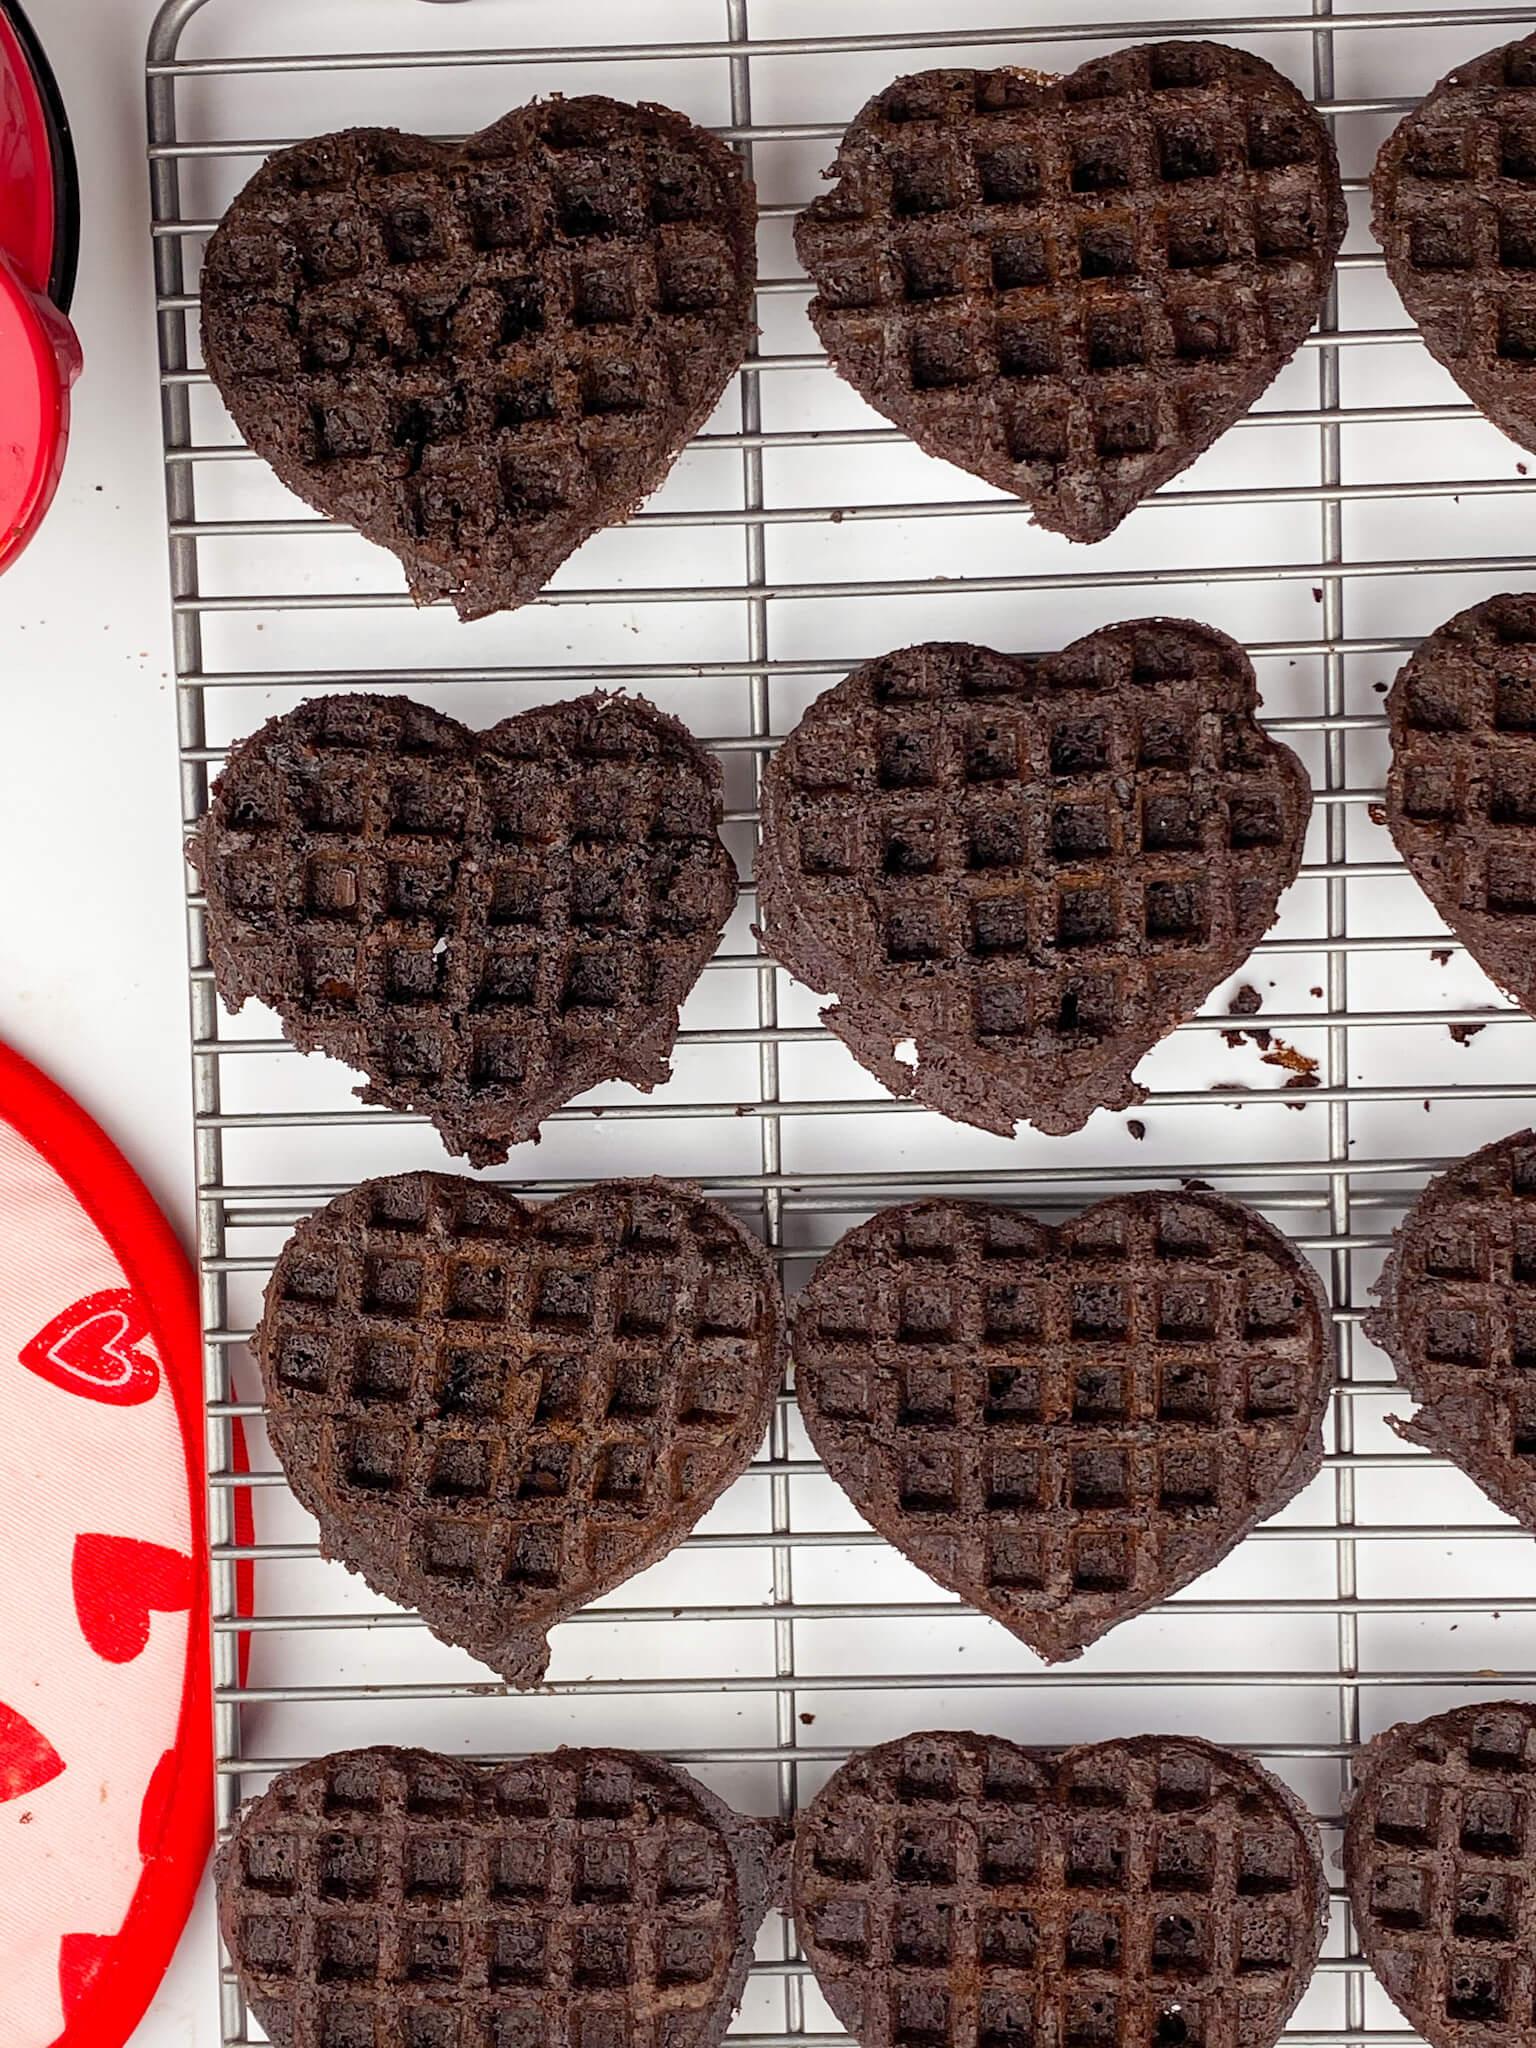 Kate's Safe & Sweet - Brownie Waffles on Rack